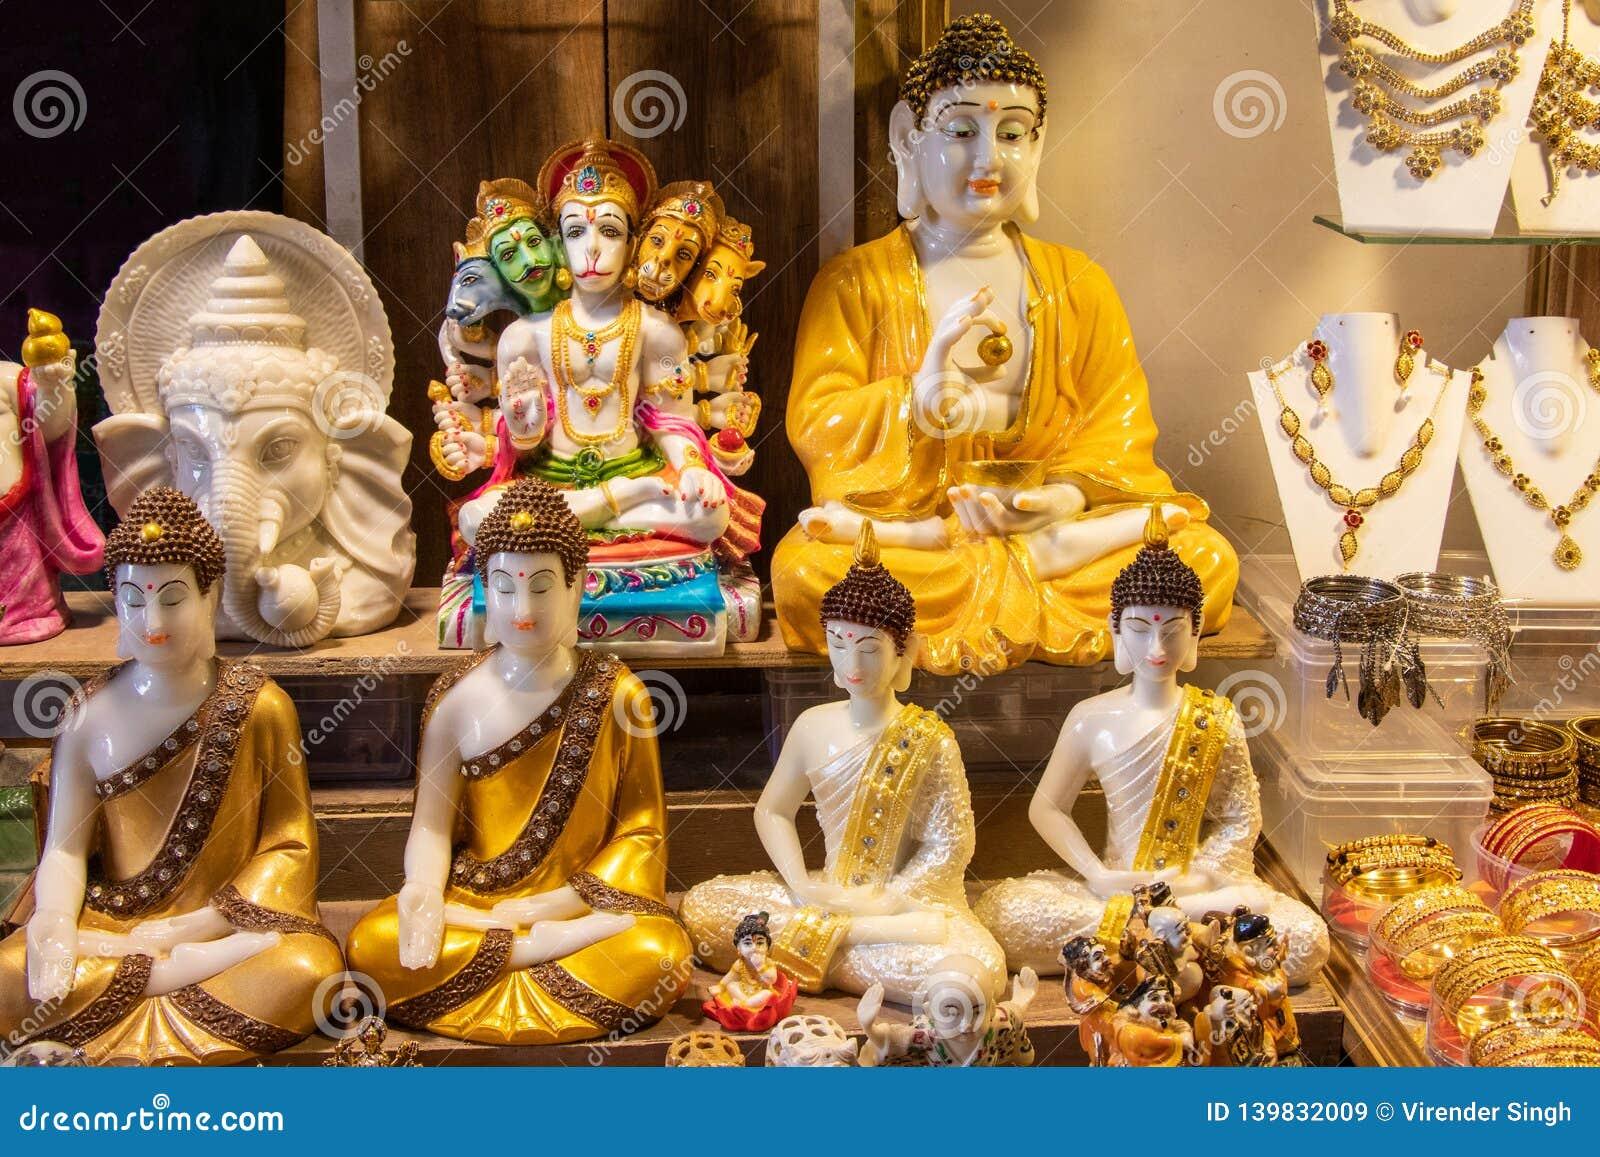 God buddha and god ganesh statue